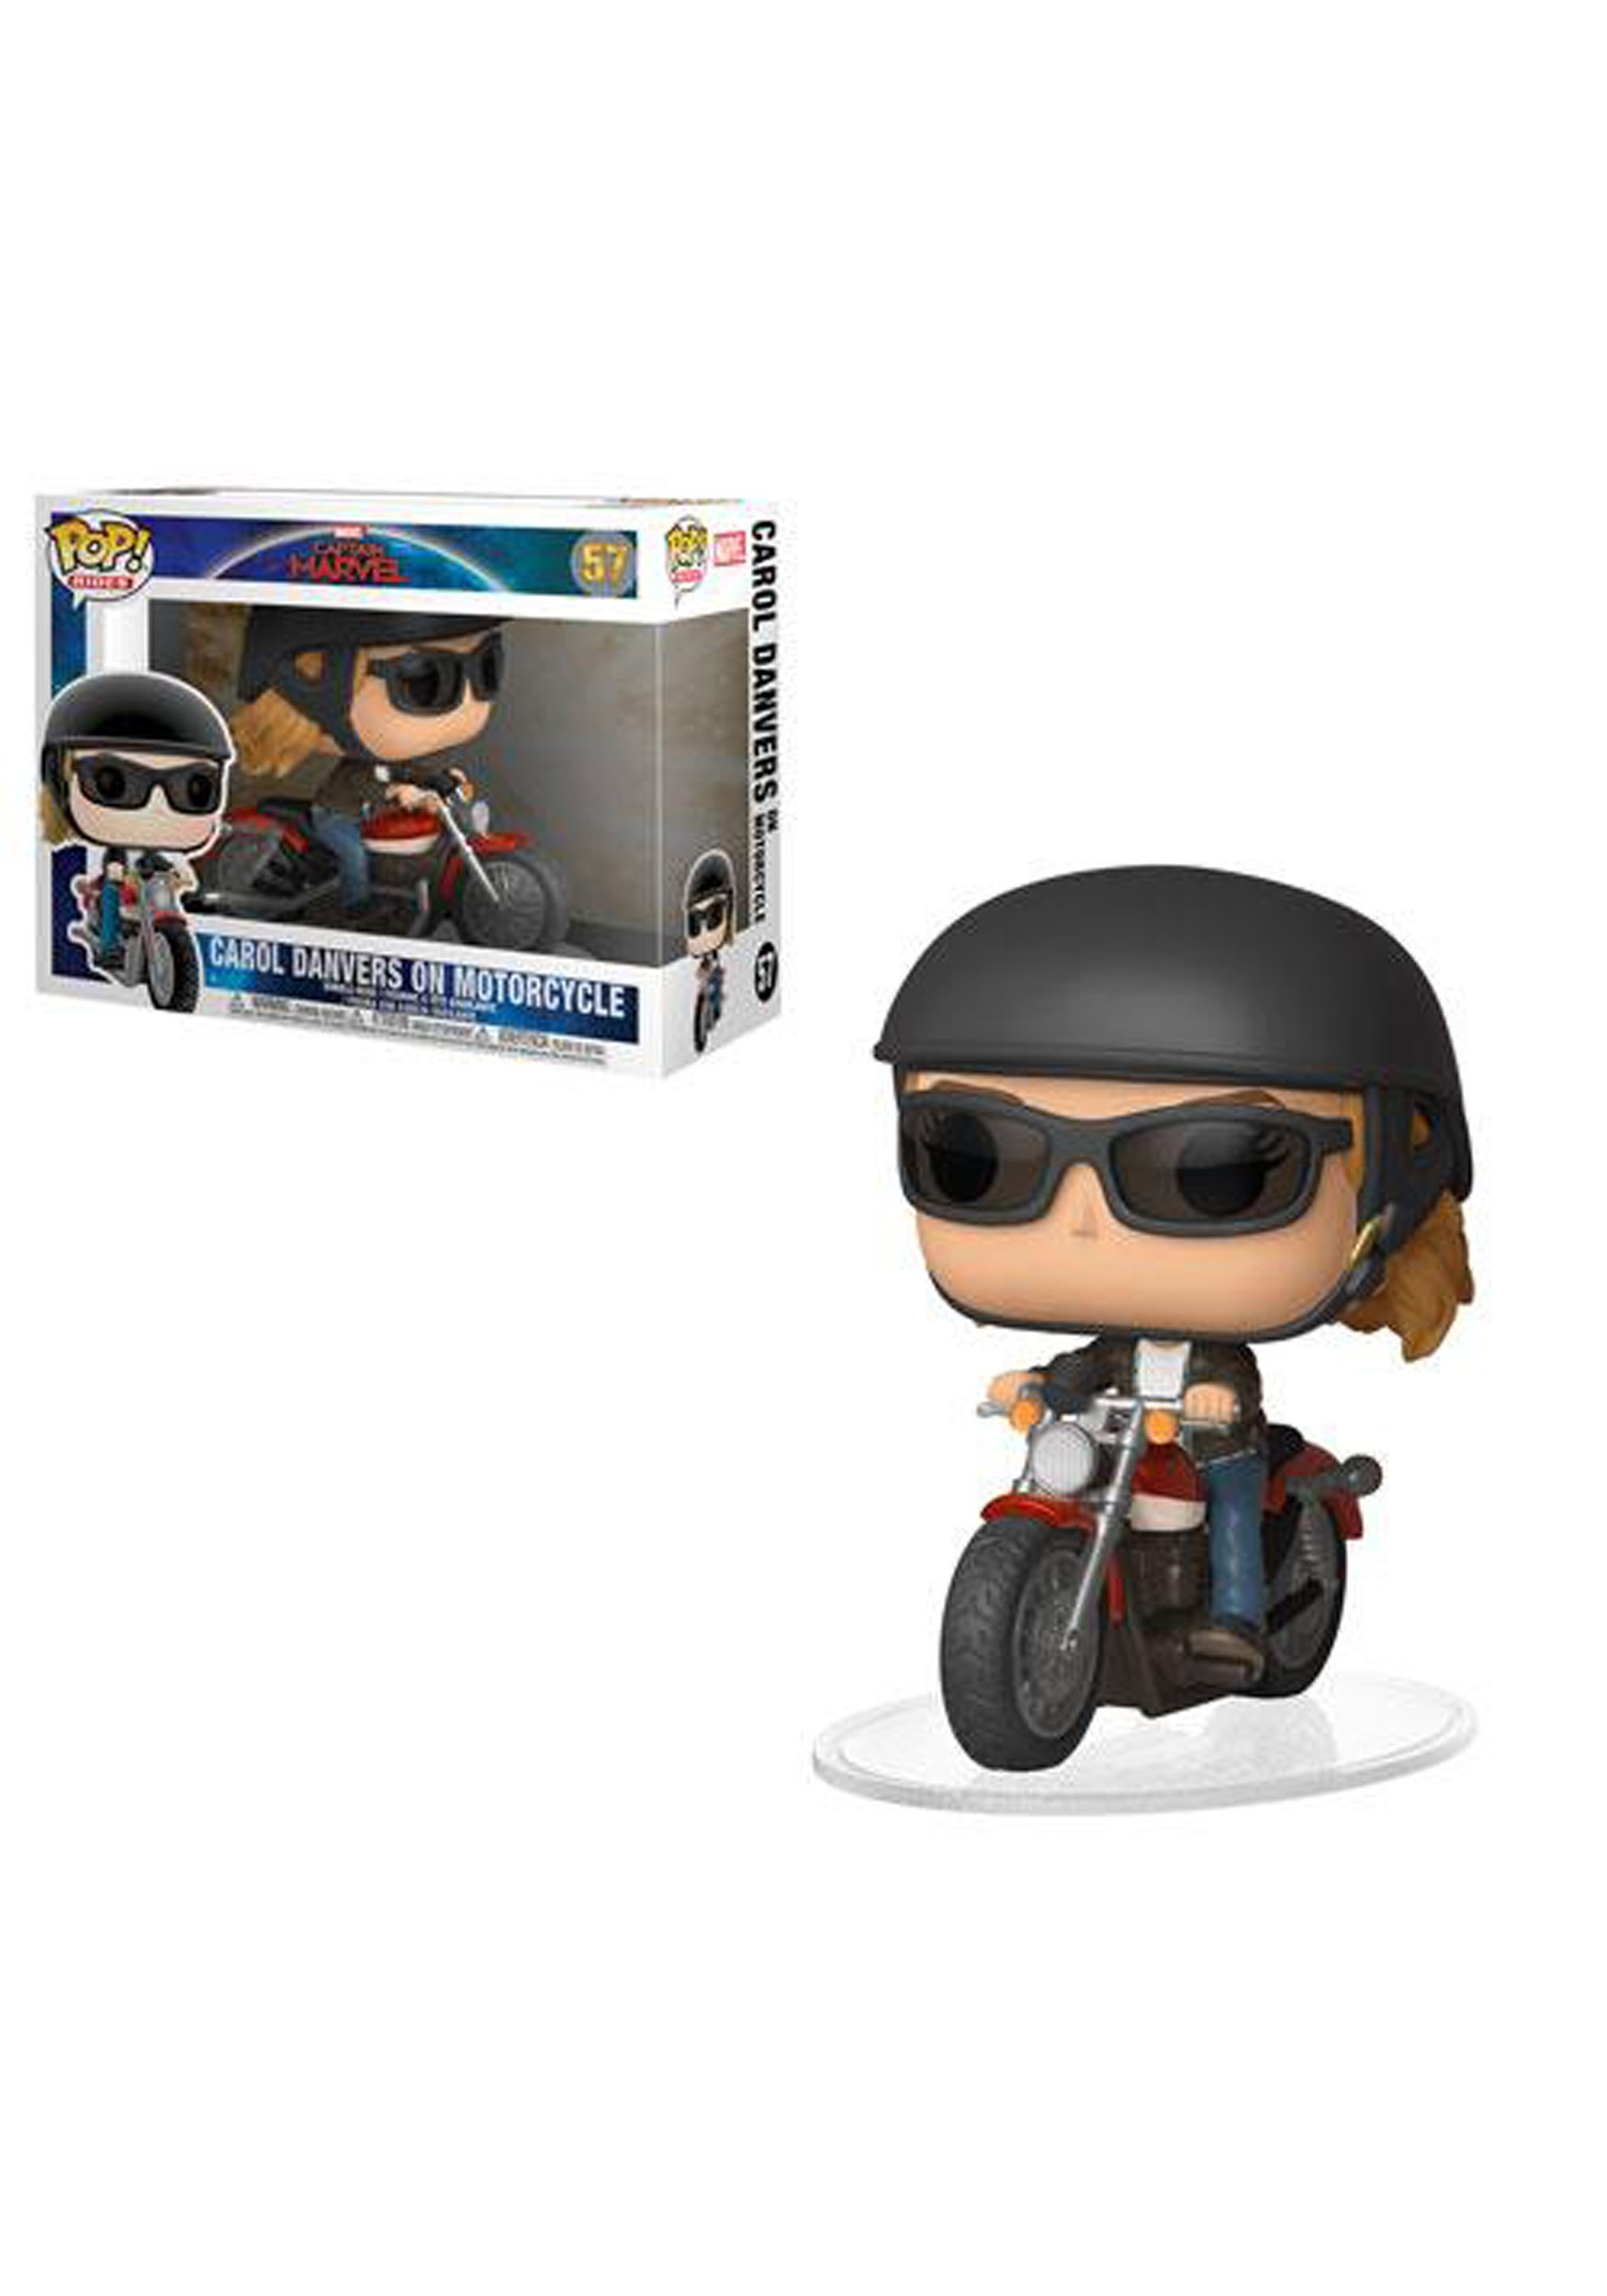 Pop! Ride: Marvel: Carol Danvers Bobblehead on Motorcycle- Captain Marvel